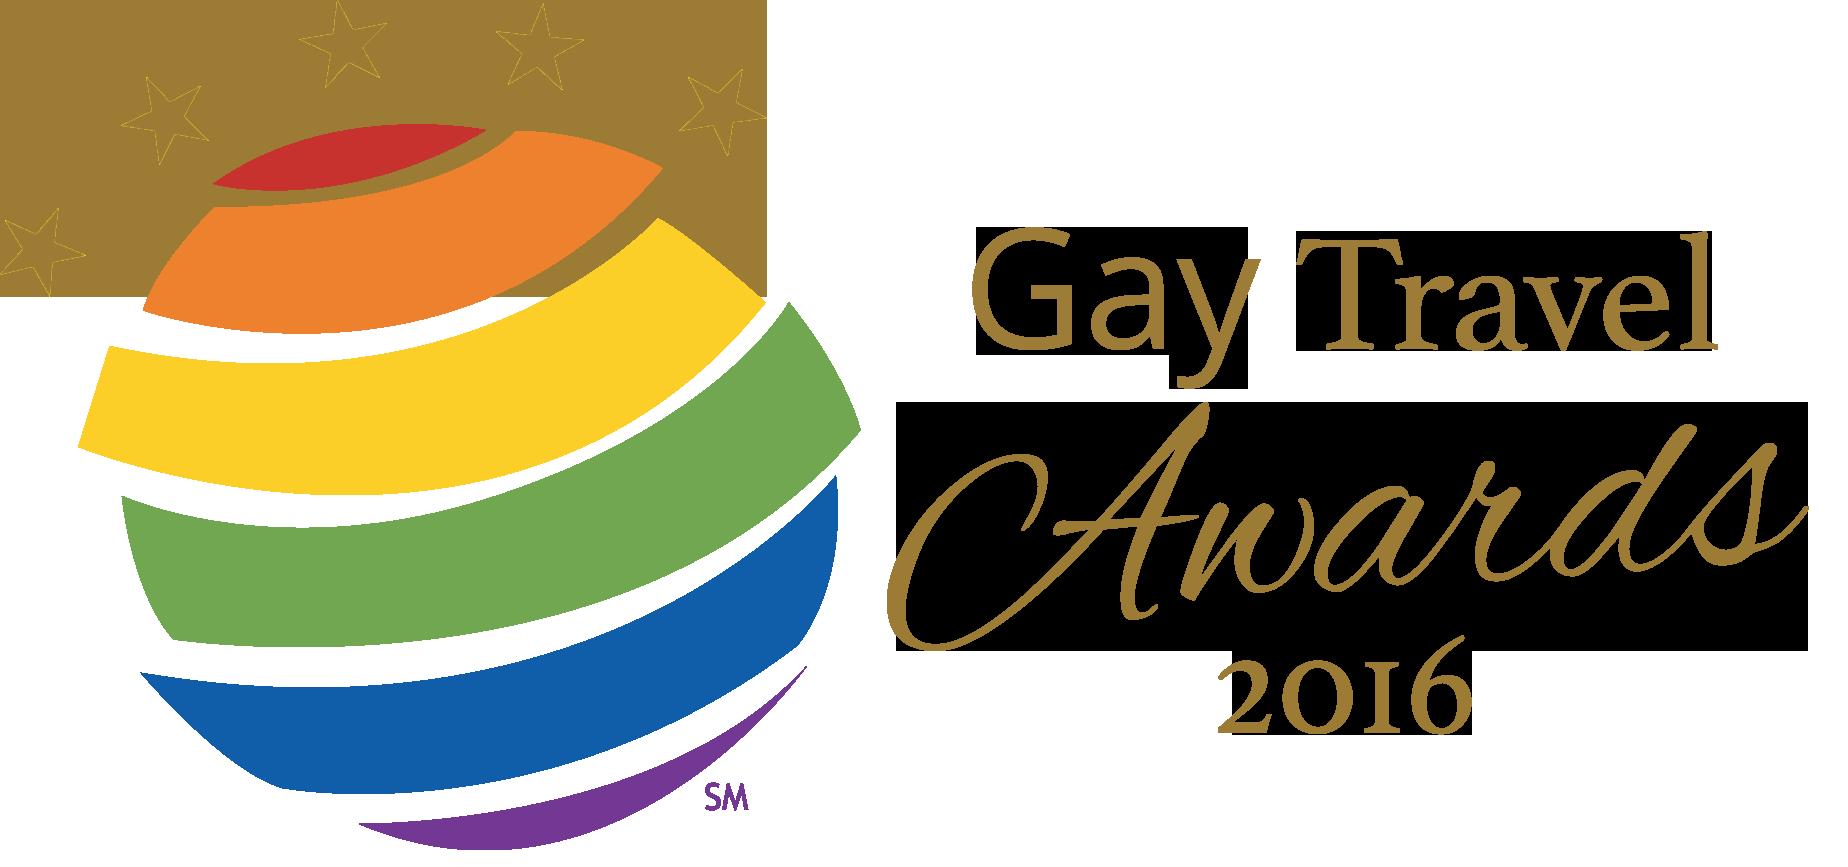 Europe clipart international travel travel. Gay history art tours